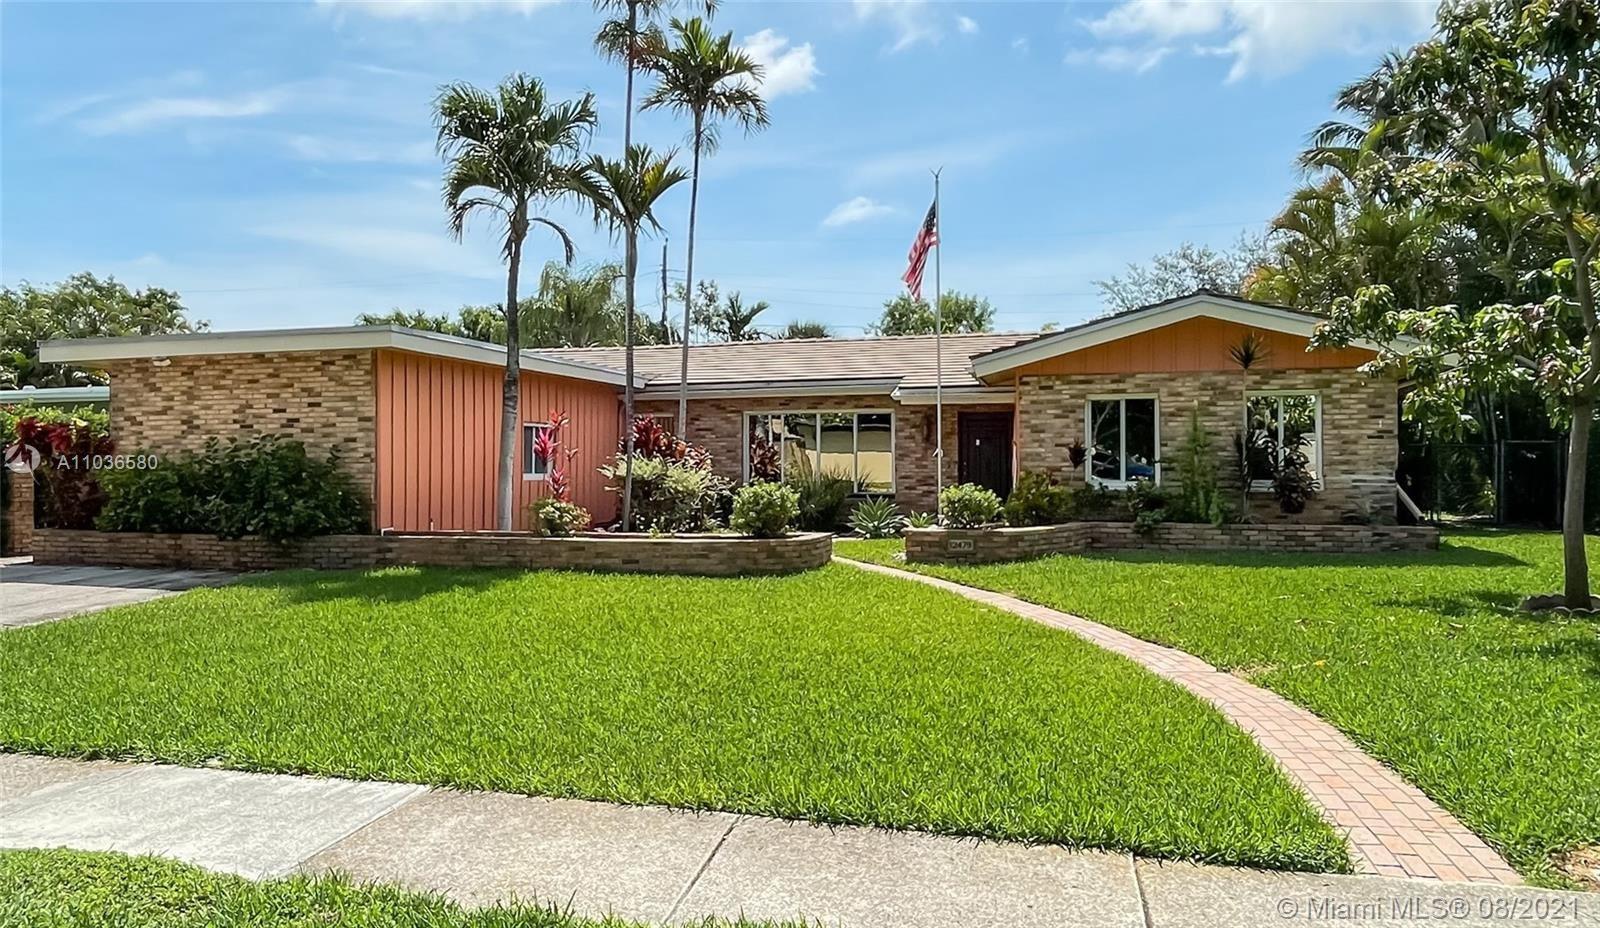 Photo of 12479 Keystone Rd, North Miami, FL 33181 (MLS # A11036580)